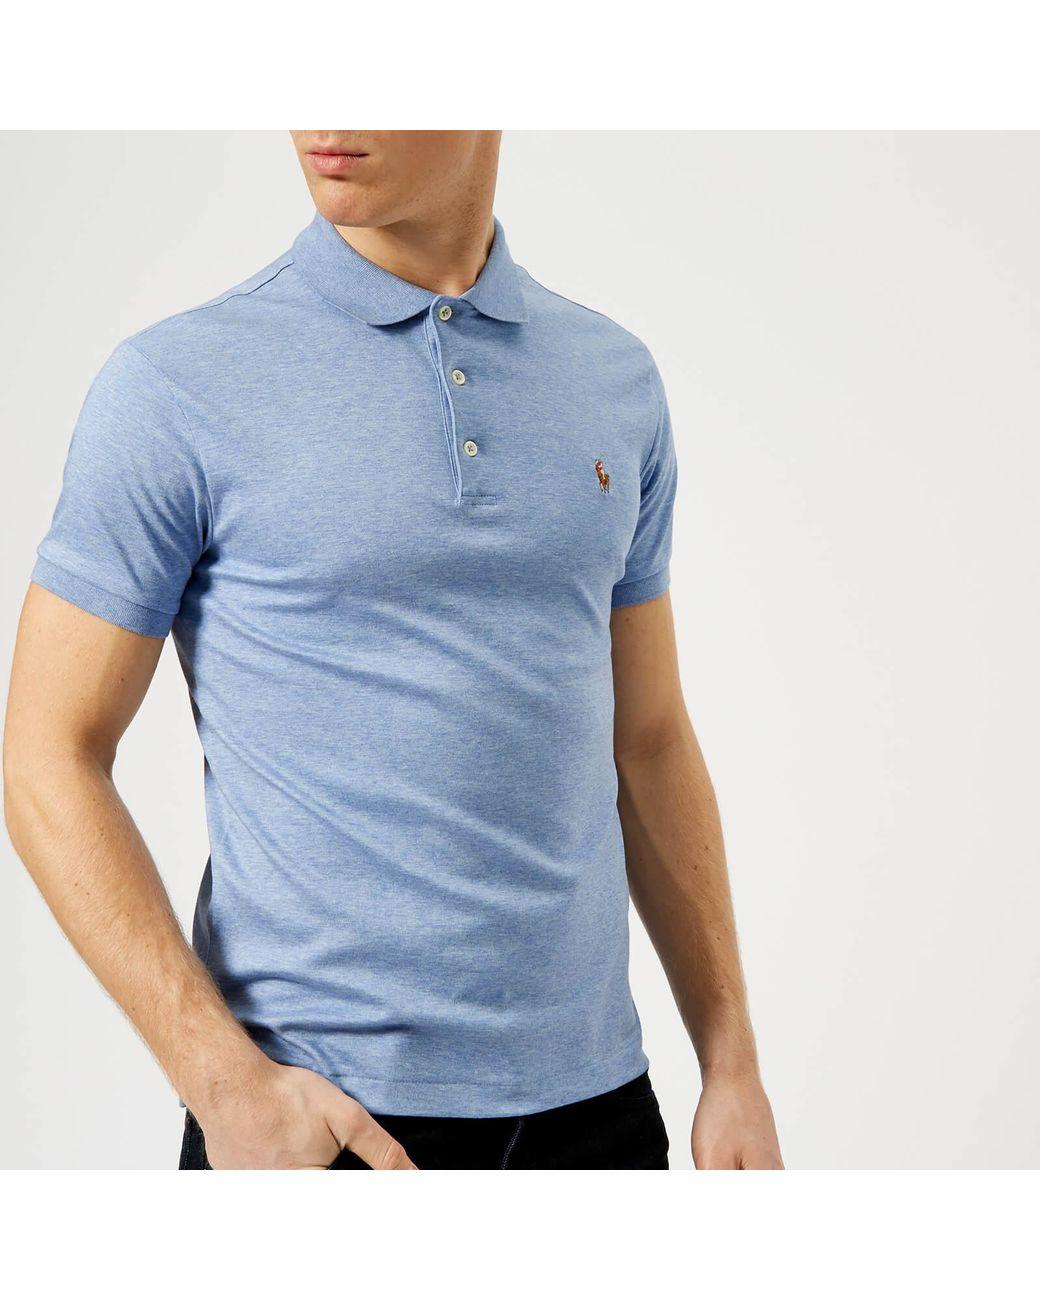 0135a8f0 Polo Ralph Lauren Pima Polo Shirt in Blue for Men - Lyst